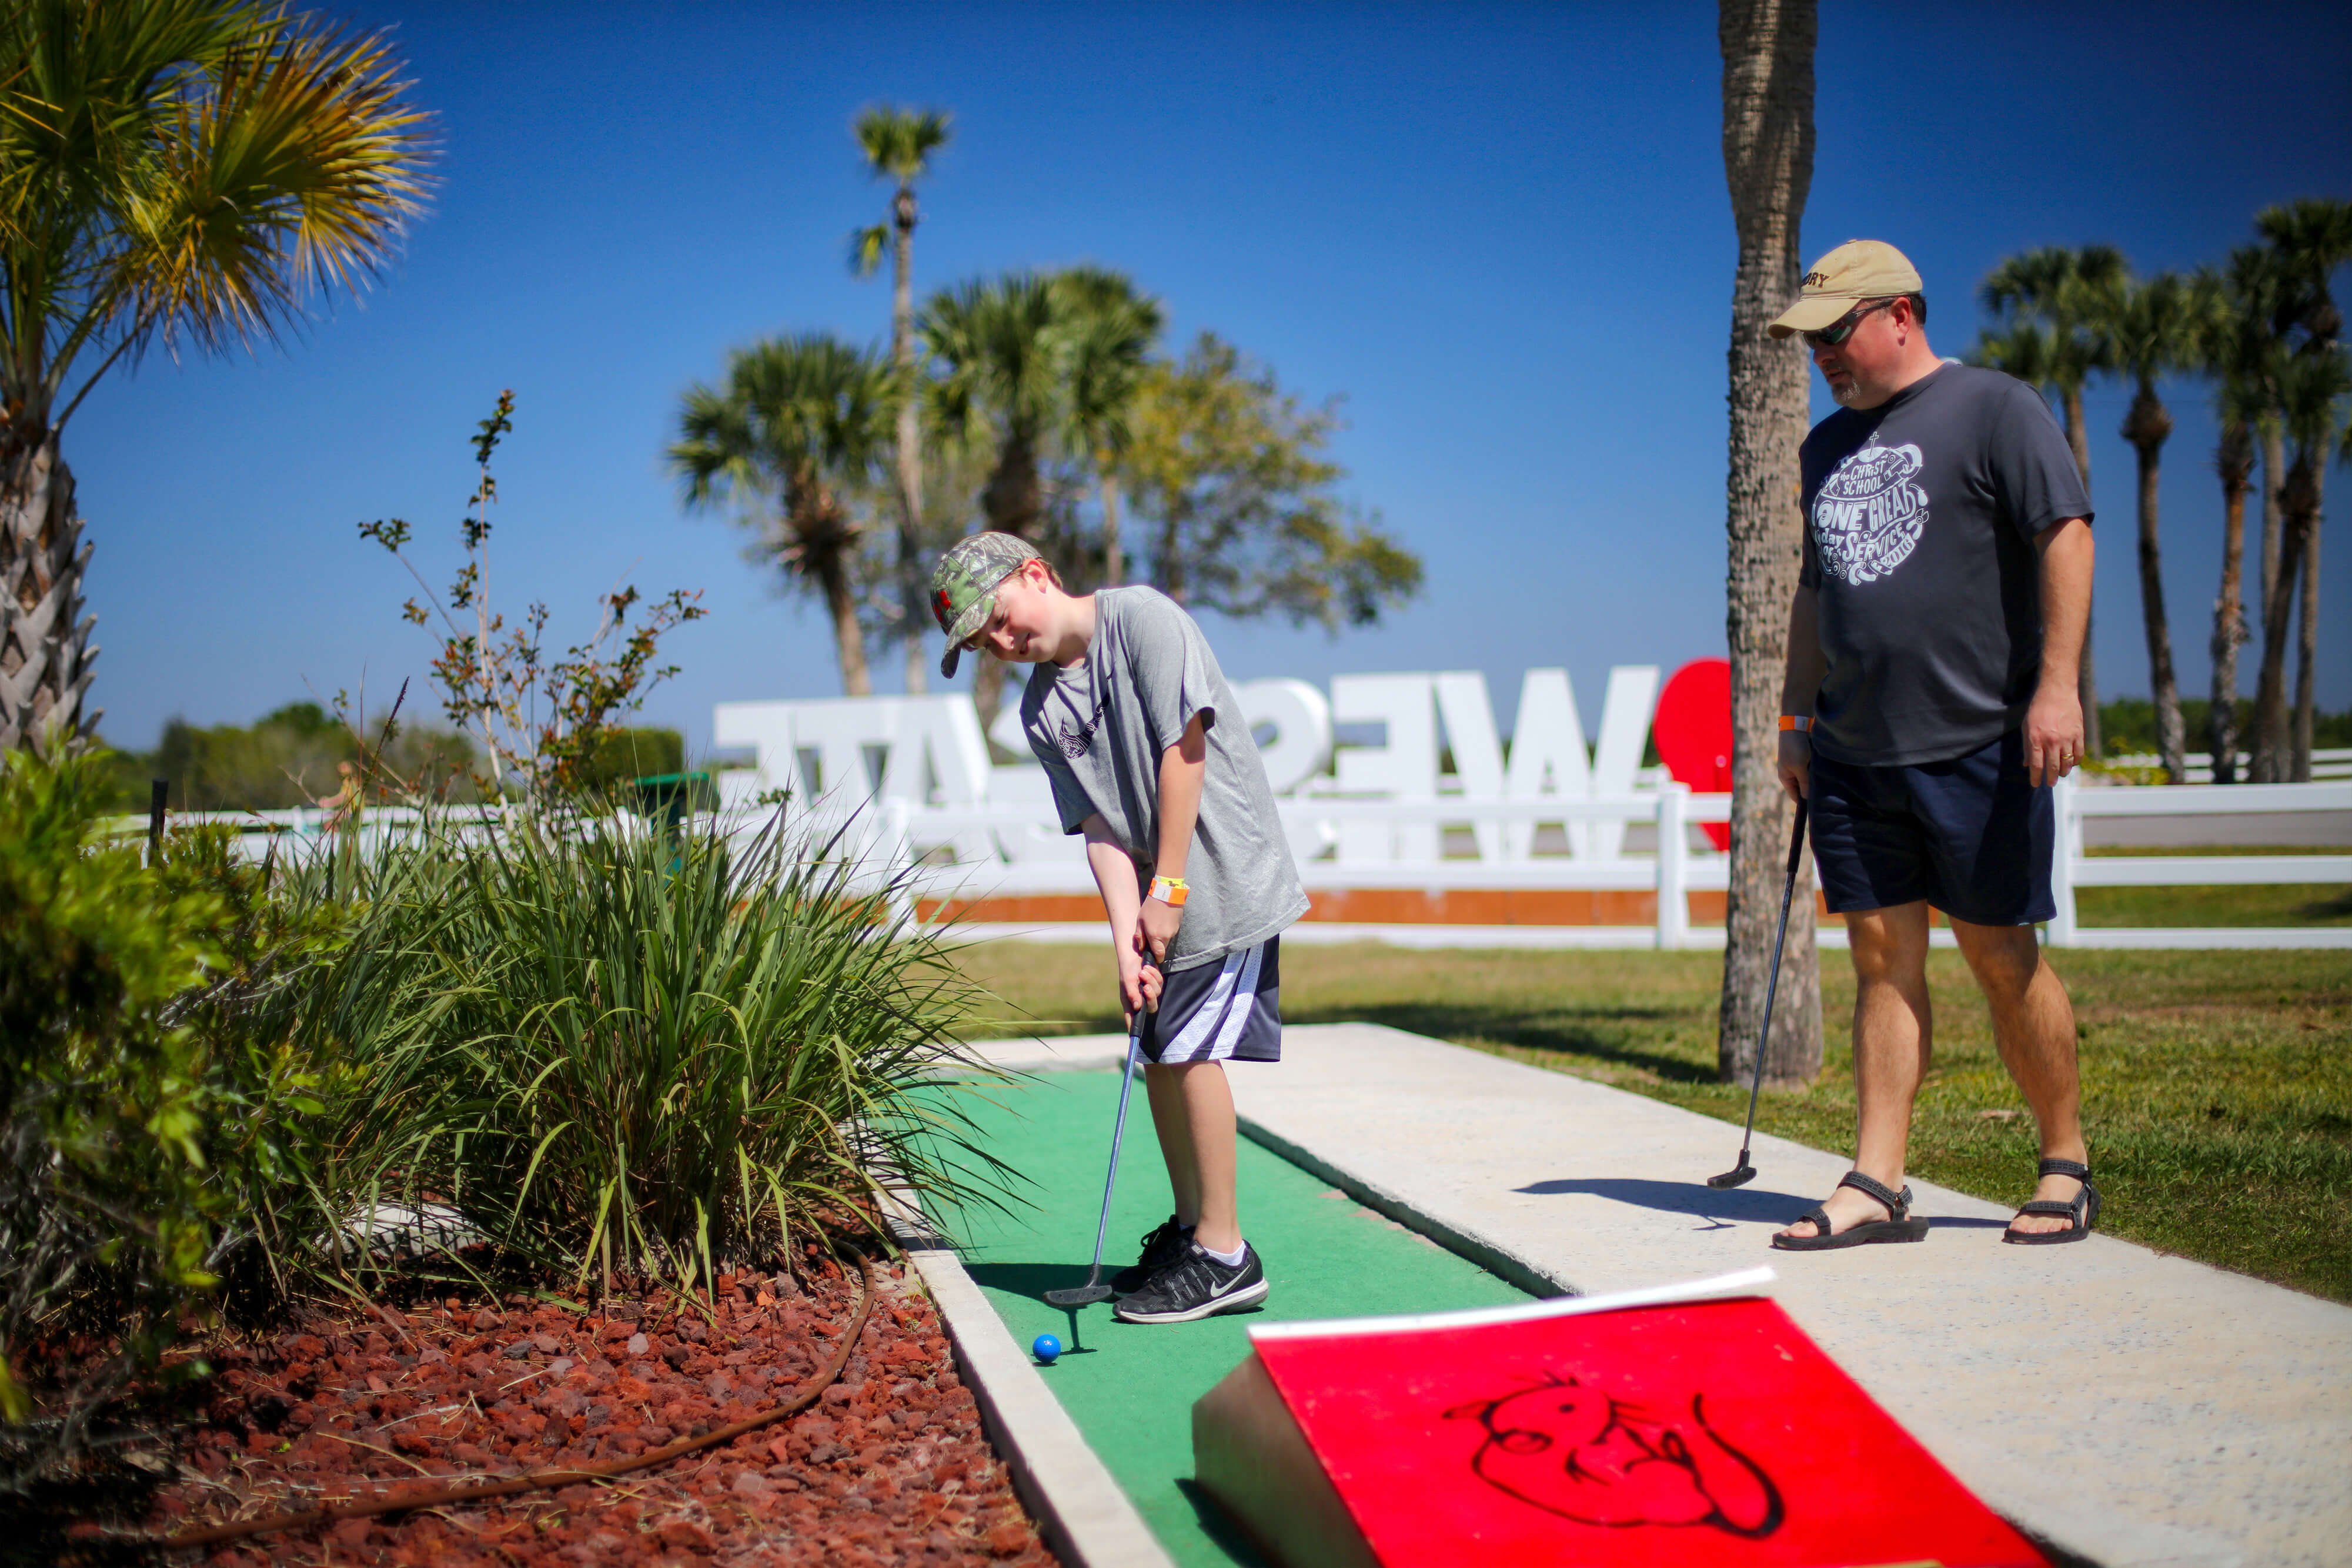 Family Mini-Golf near River Ranch, FL |  Westgate River Ranch Resort & Rodeo | Westgate Resorts